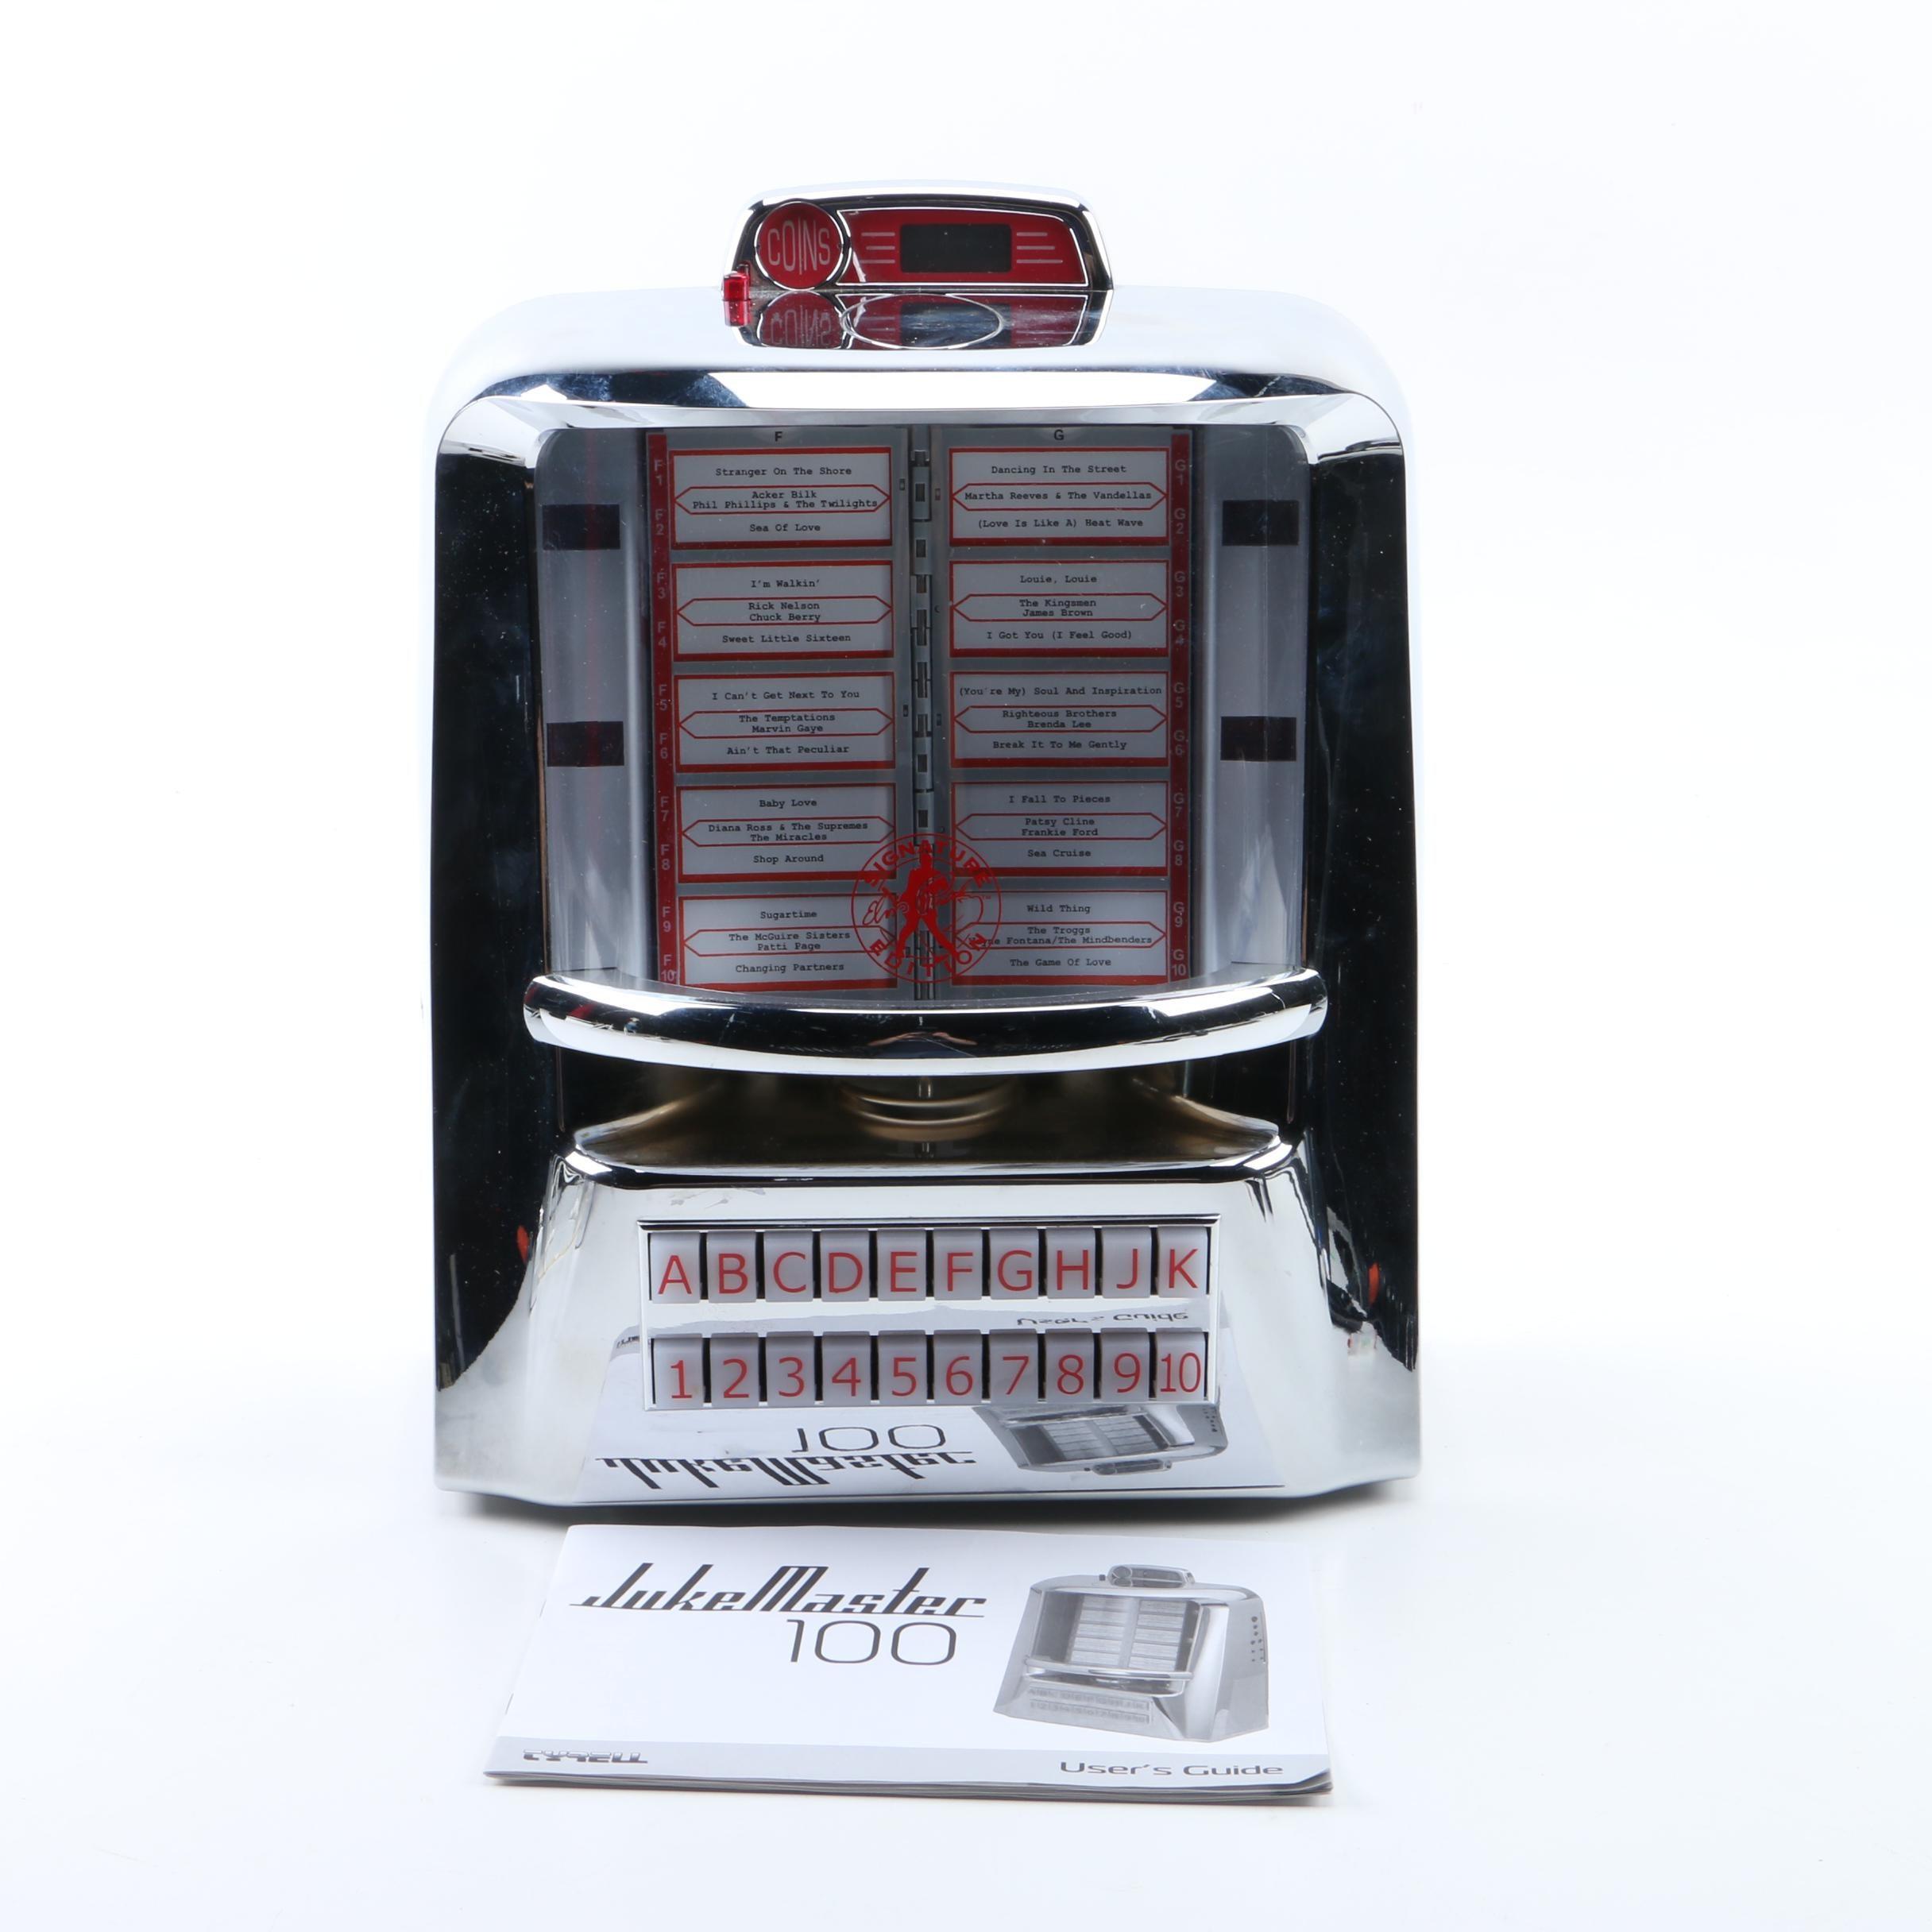 Tyrell Jukemaster 100 MP3, CD Player/FM Radio